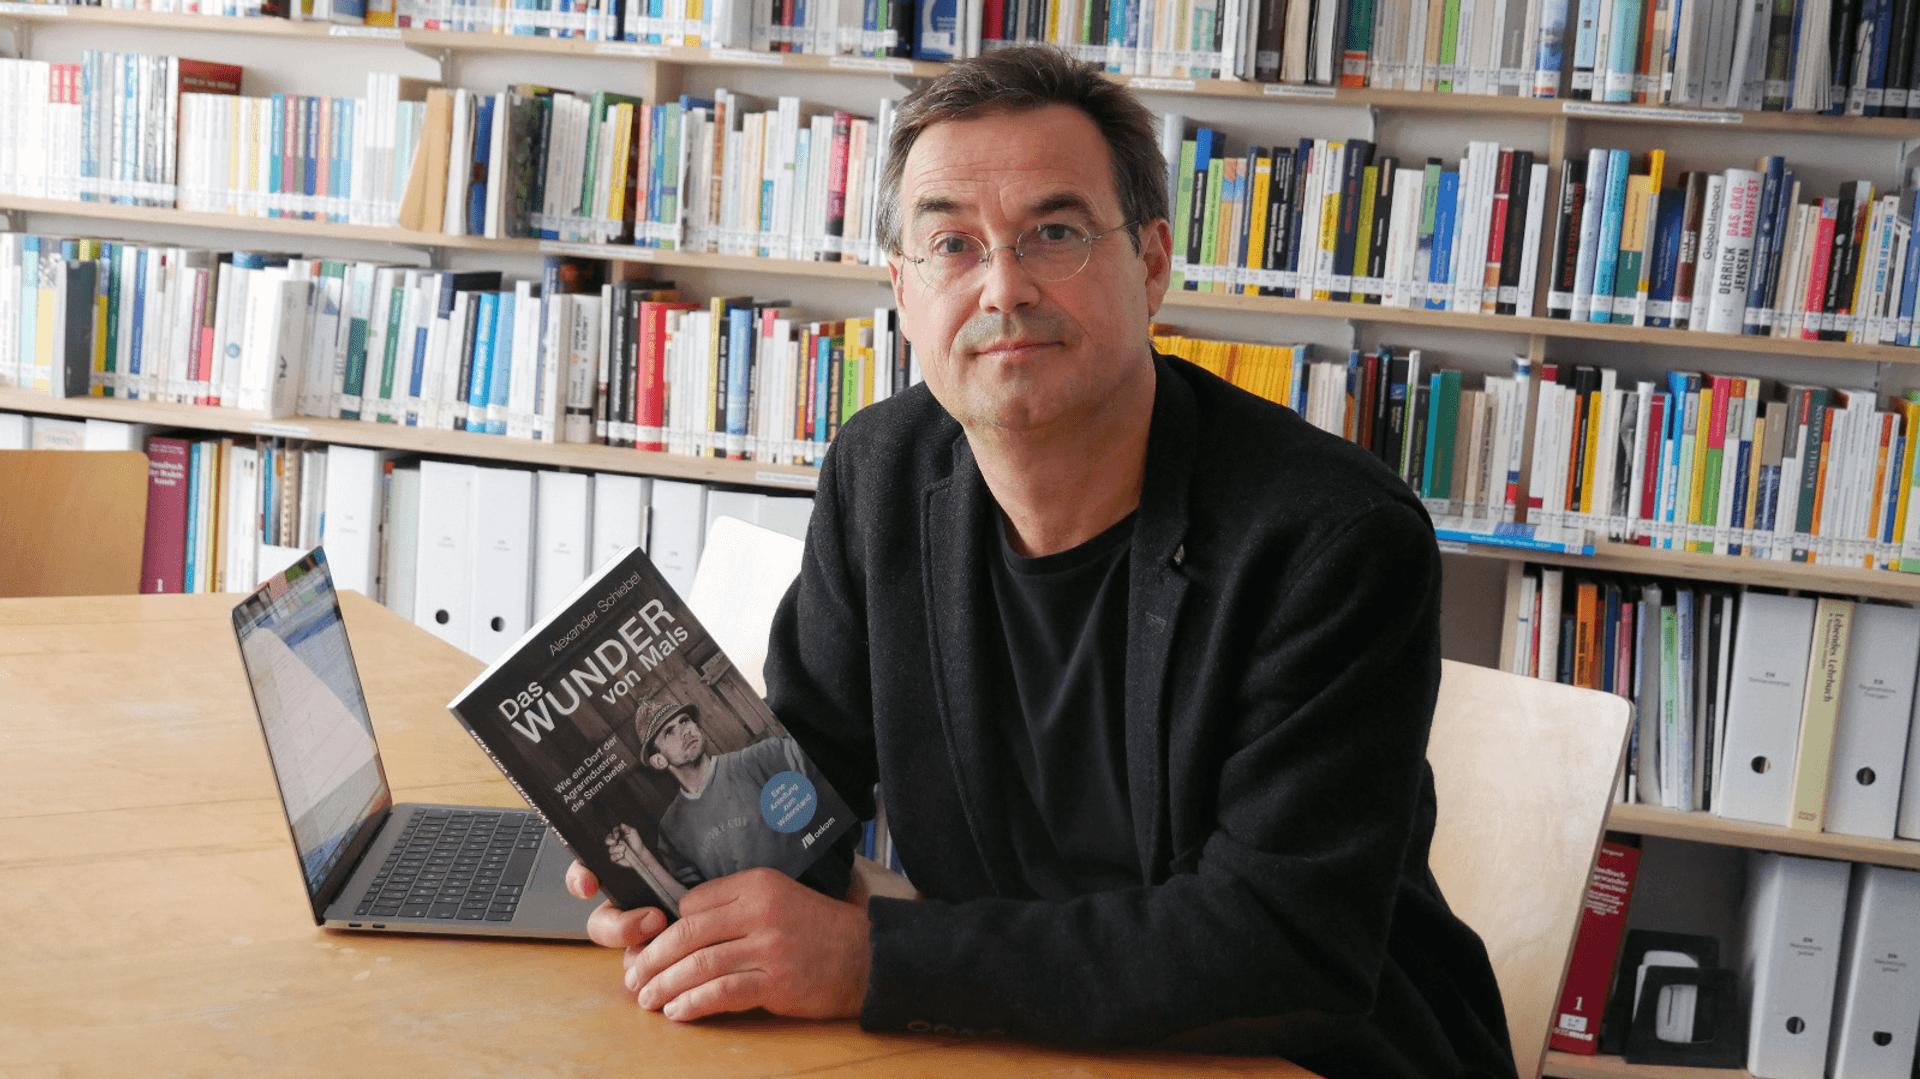 Jacob Radloff mit dem Buch